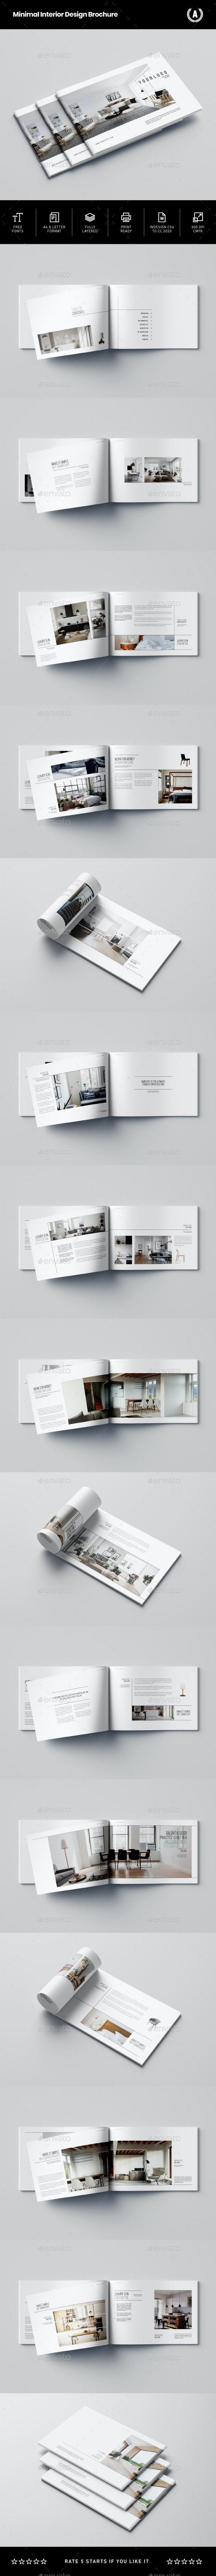 Minimal Interior Design Brochure - Brochures Print Templates